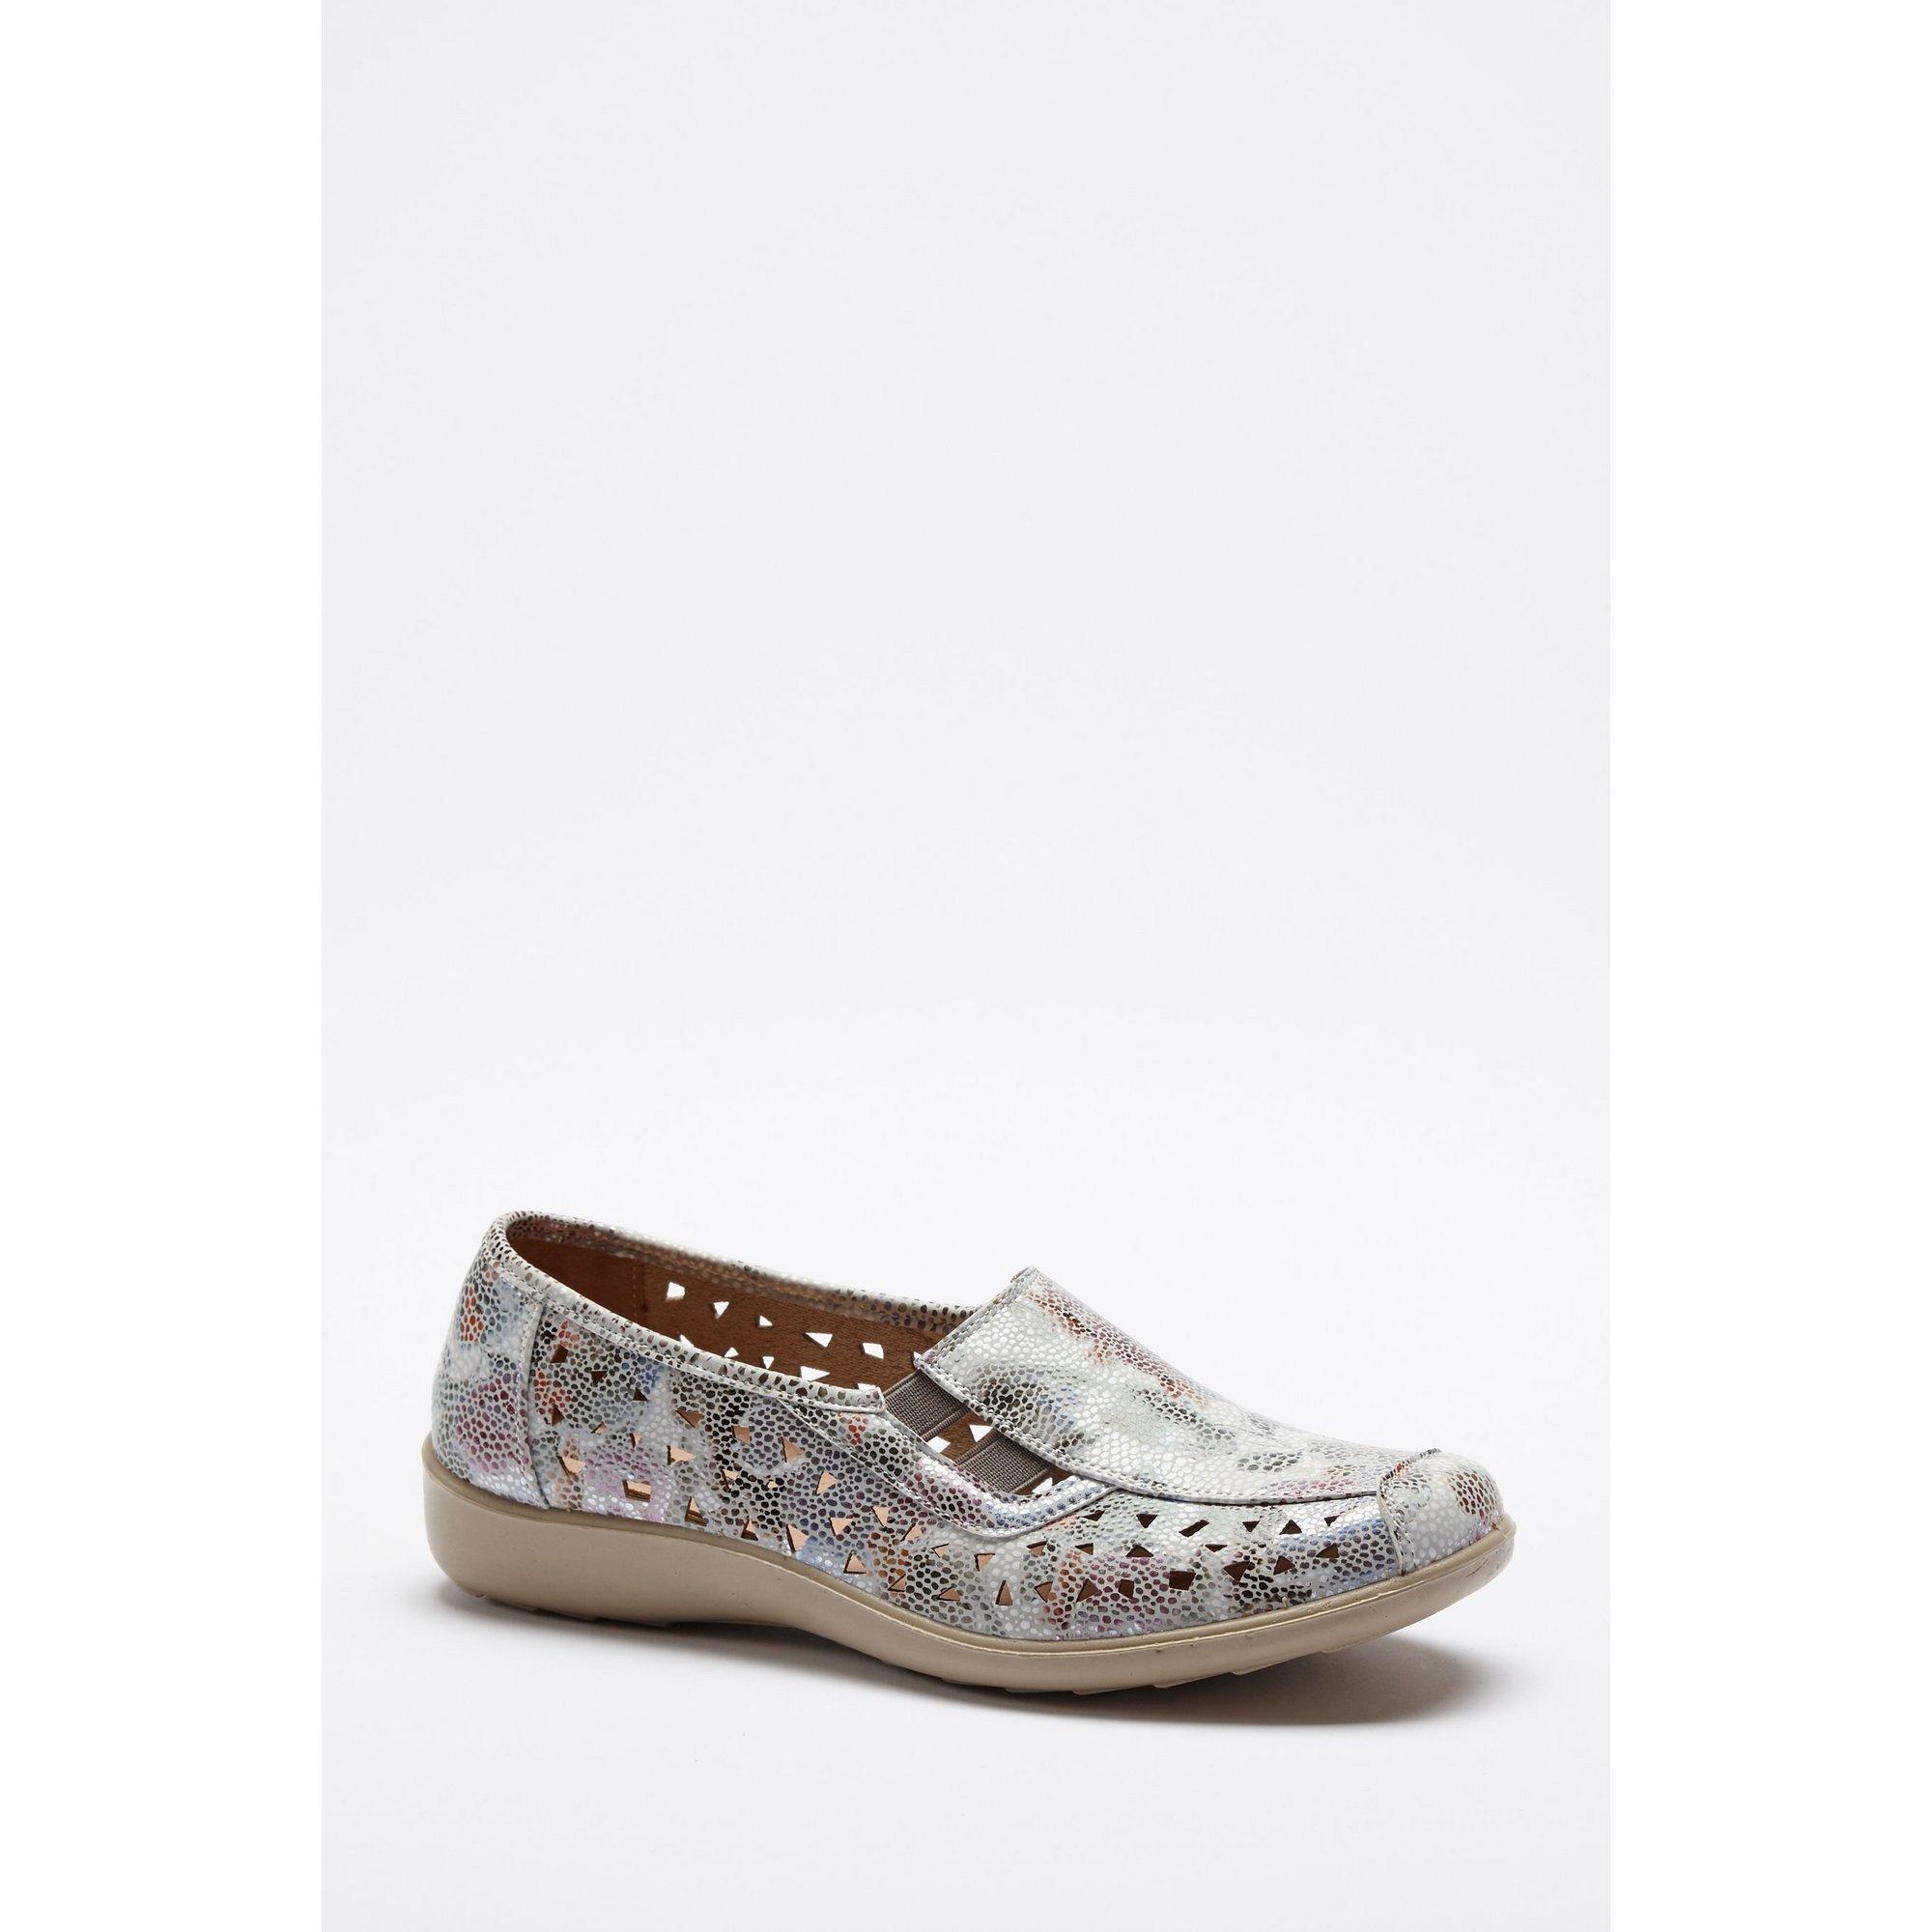 Image of Cushion Walk Gemma Floral Slip-On Shoes